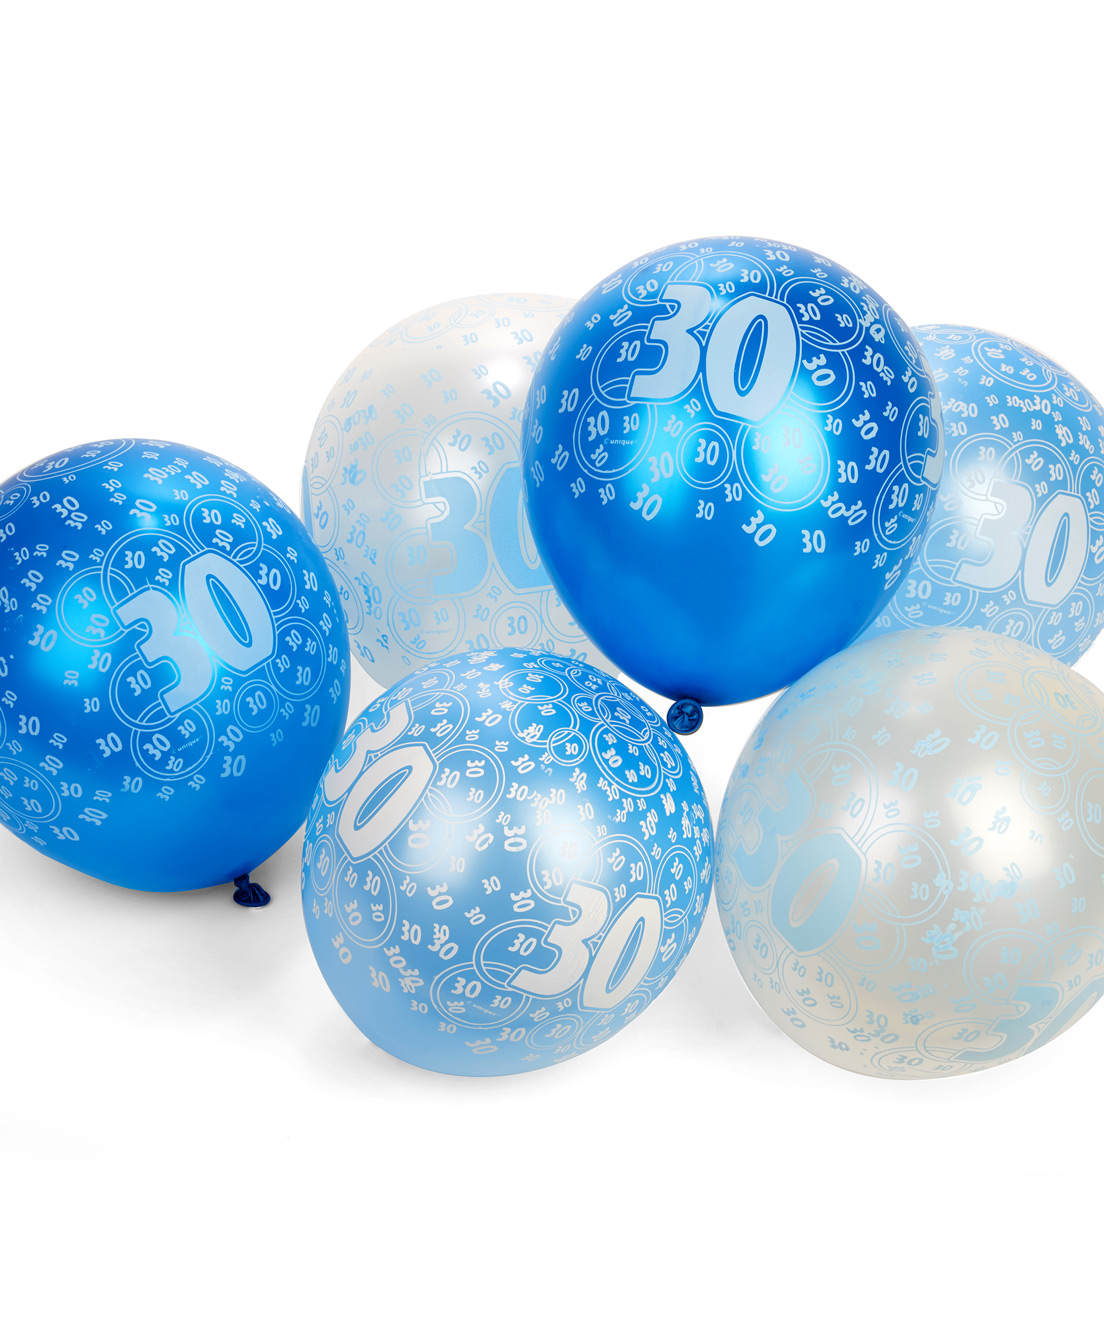 ballonnen 30 jaar Blauwe ballonnen 30 jaar : Decoratie,en goedkope carnavalskleding  ballonnen 30 jaar